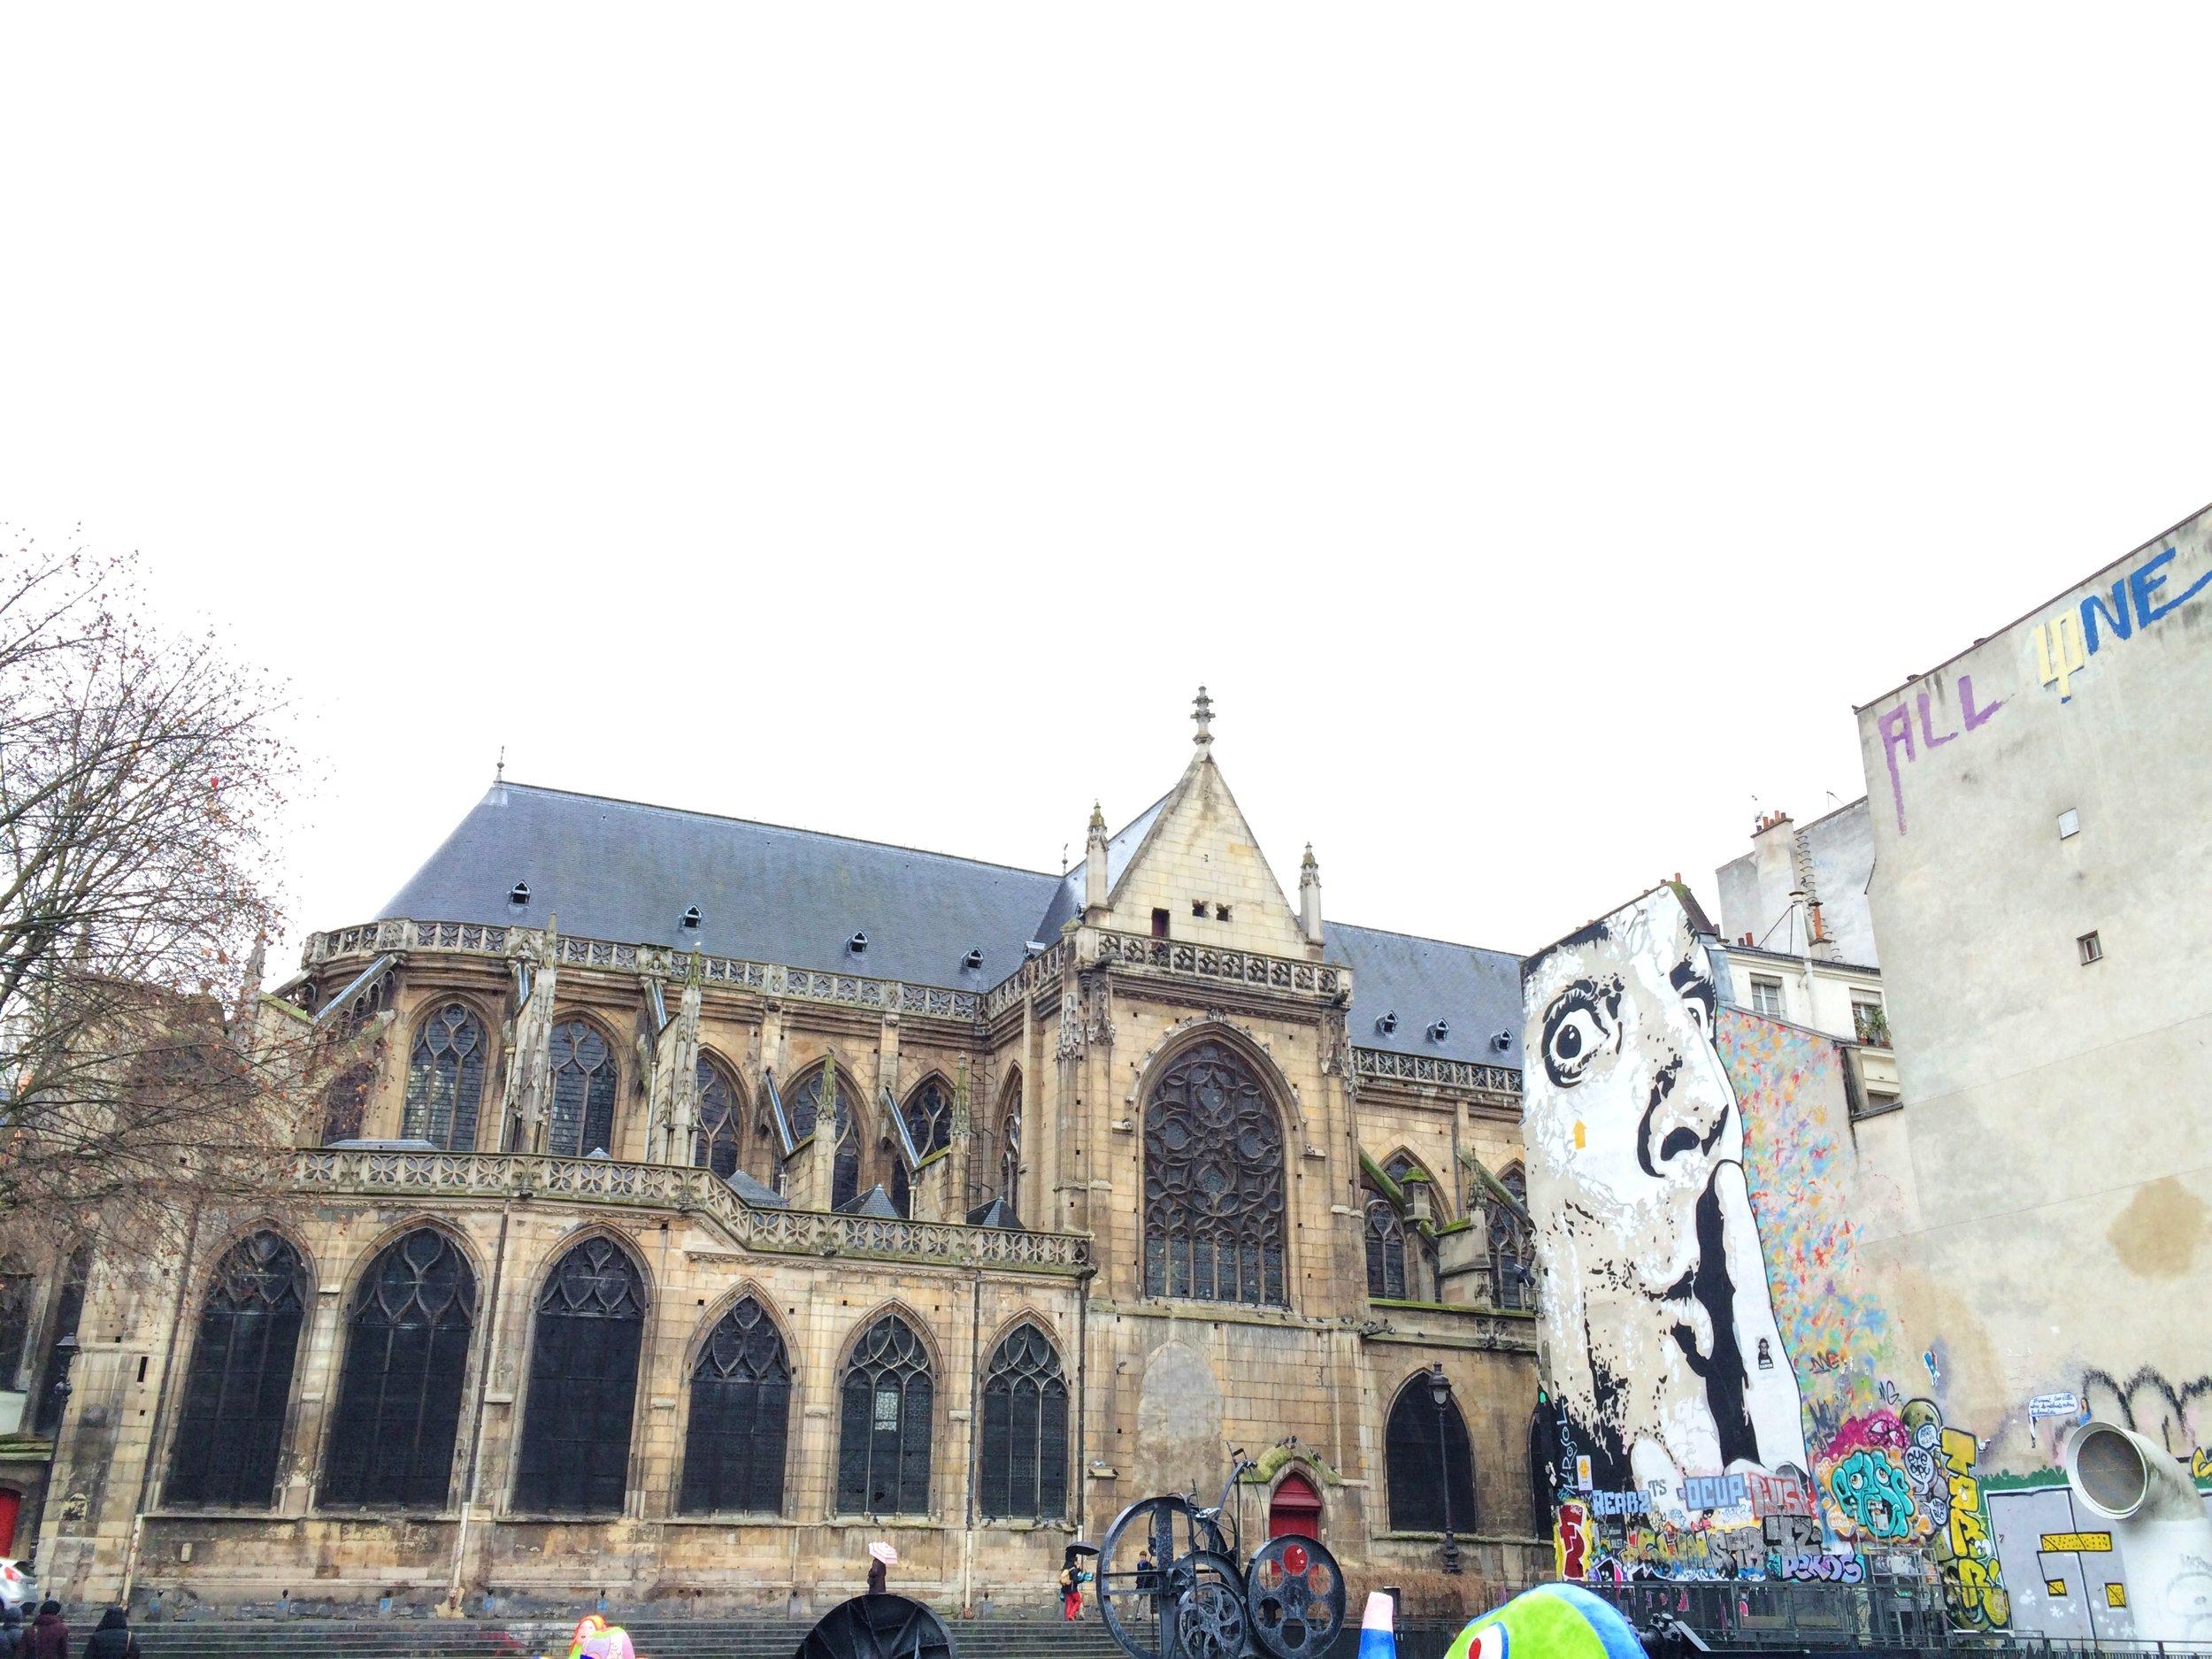 Church of Saint Merri   Paris   source: Alexis Rockley, Local (Tourist)